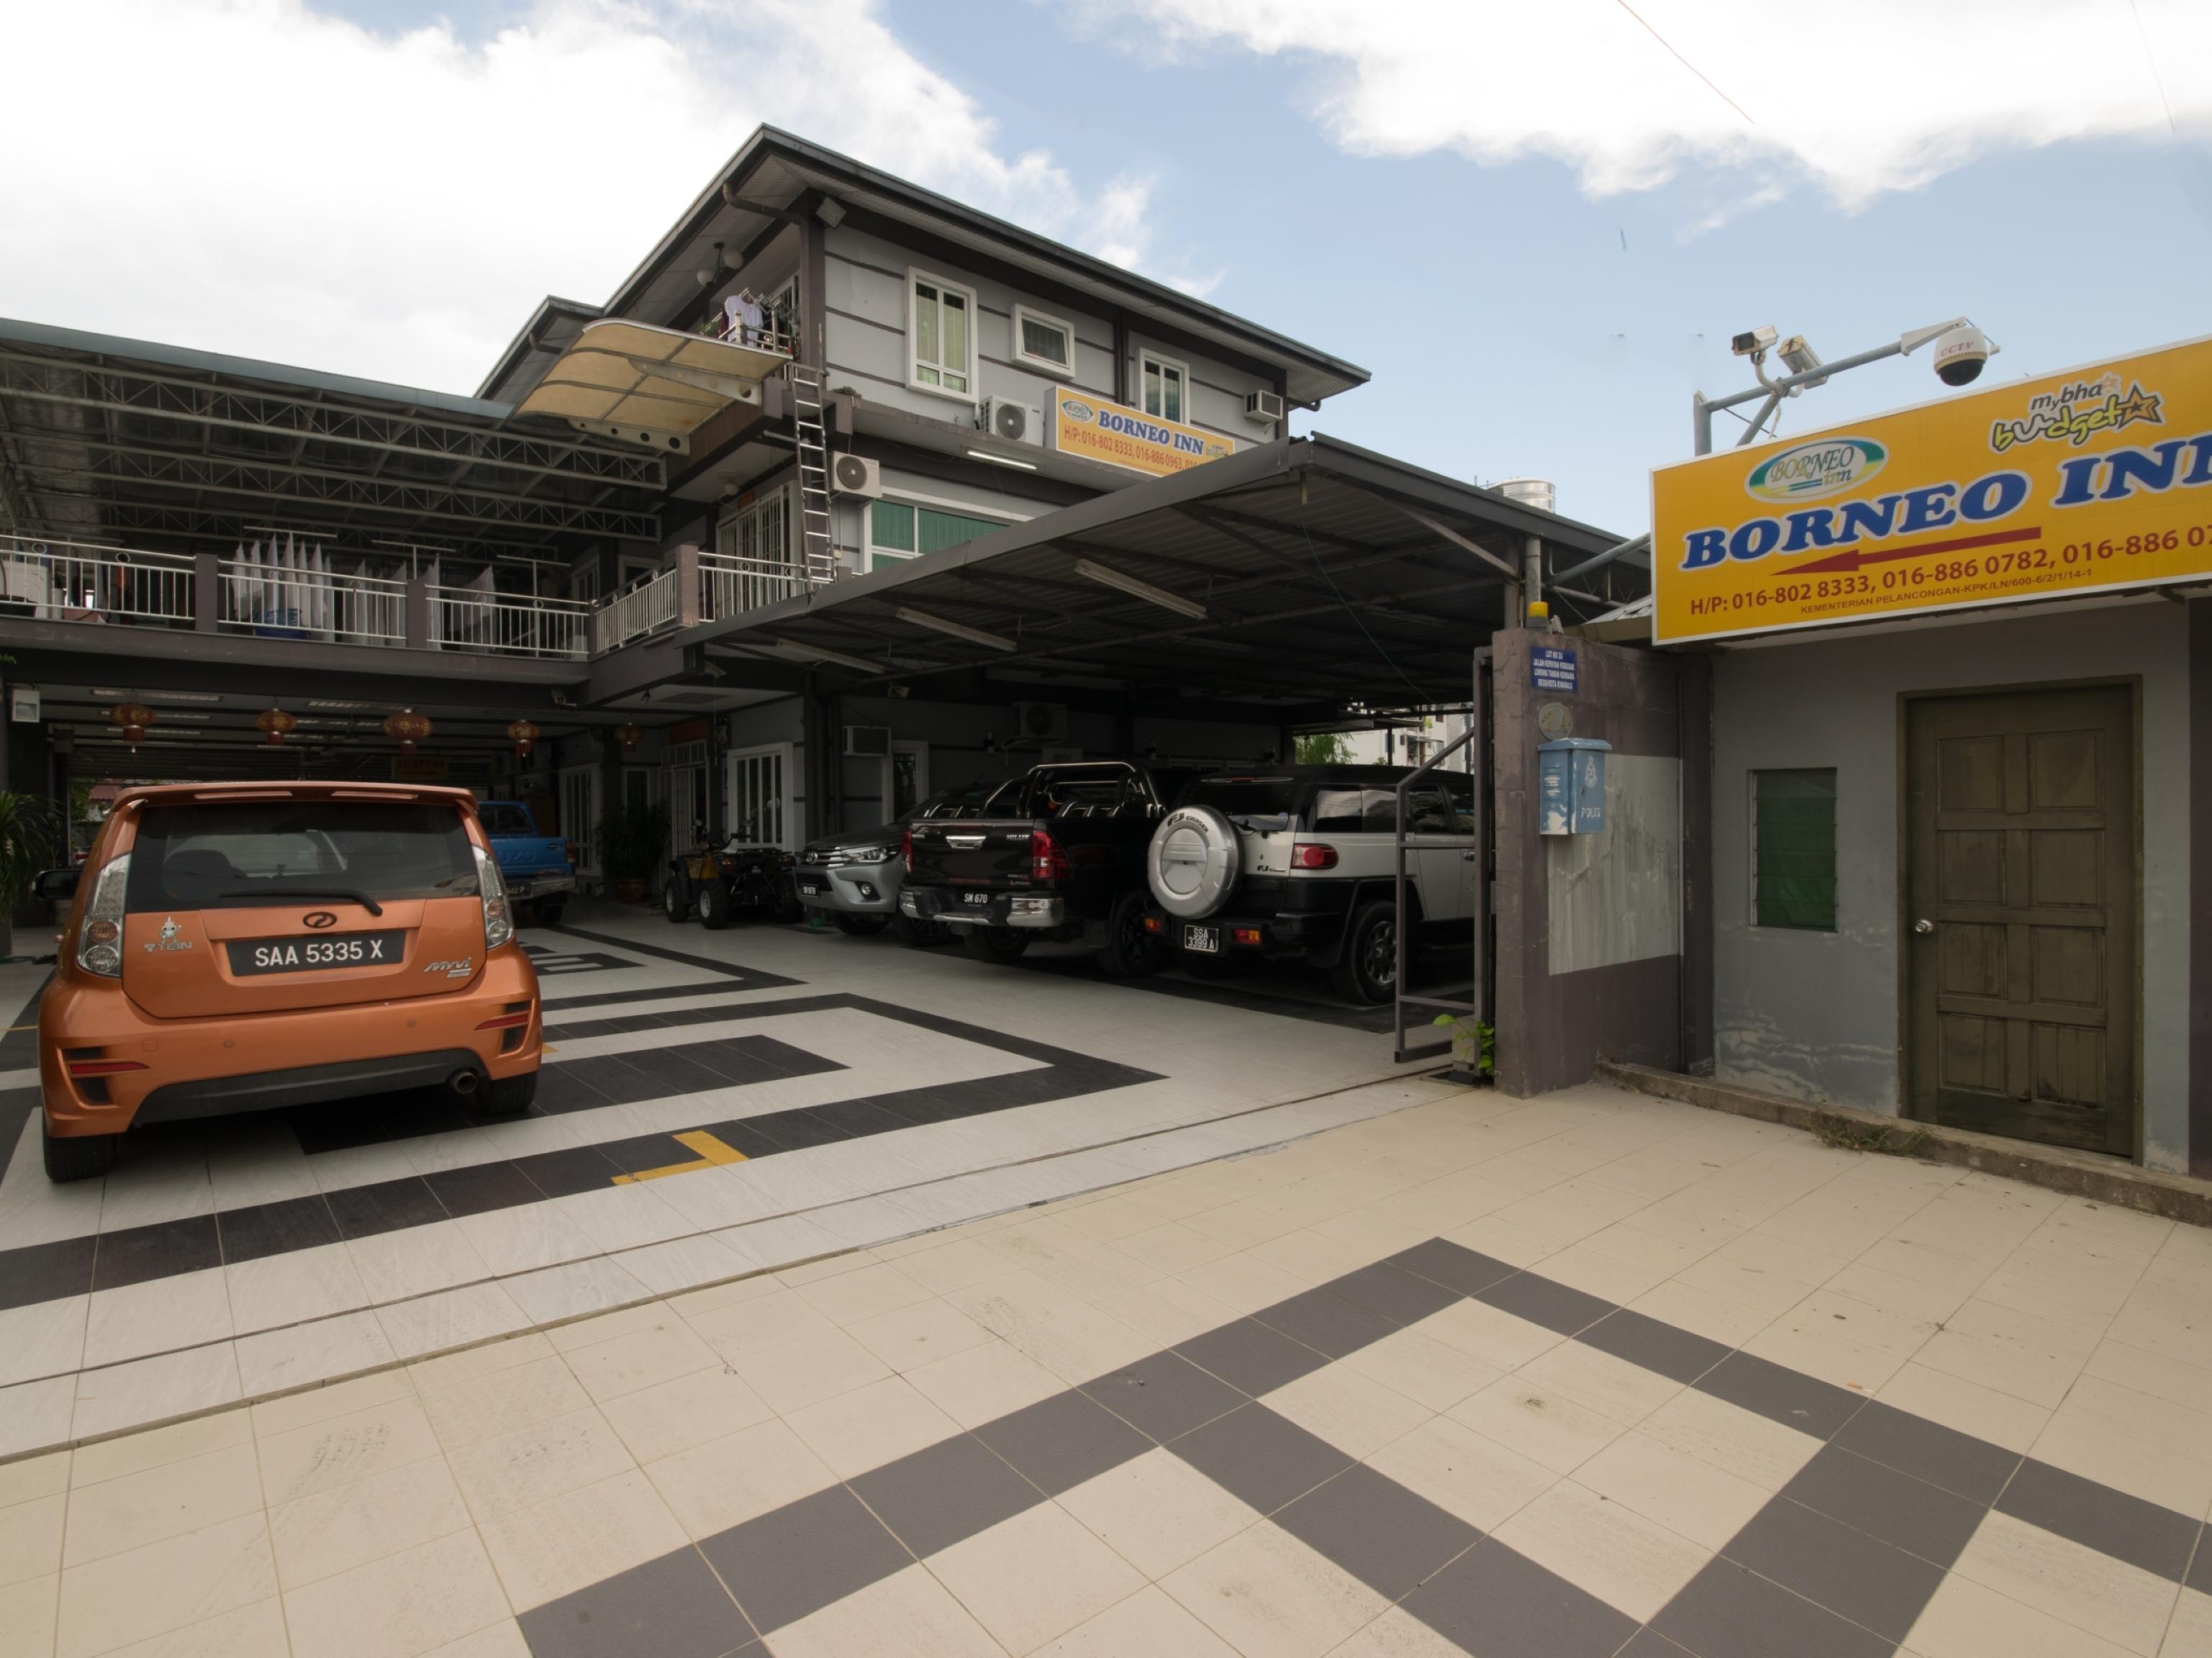 OYO 1103 Borneo Inn, Penampang